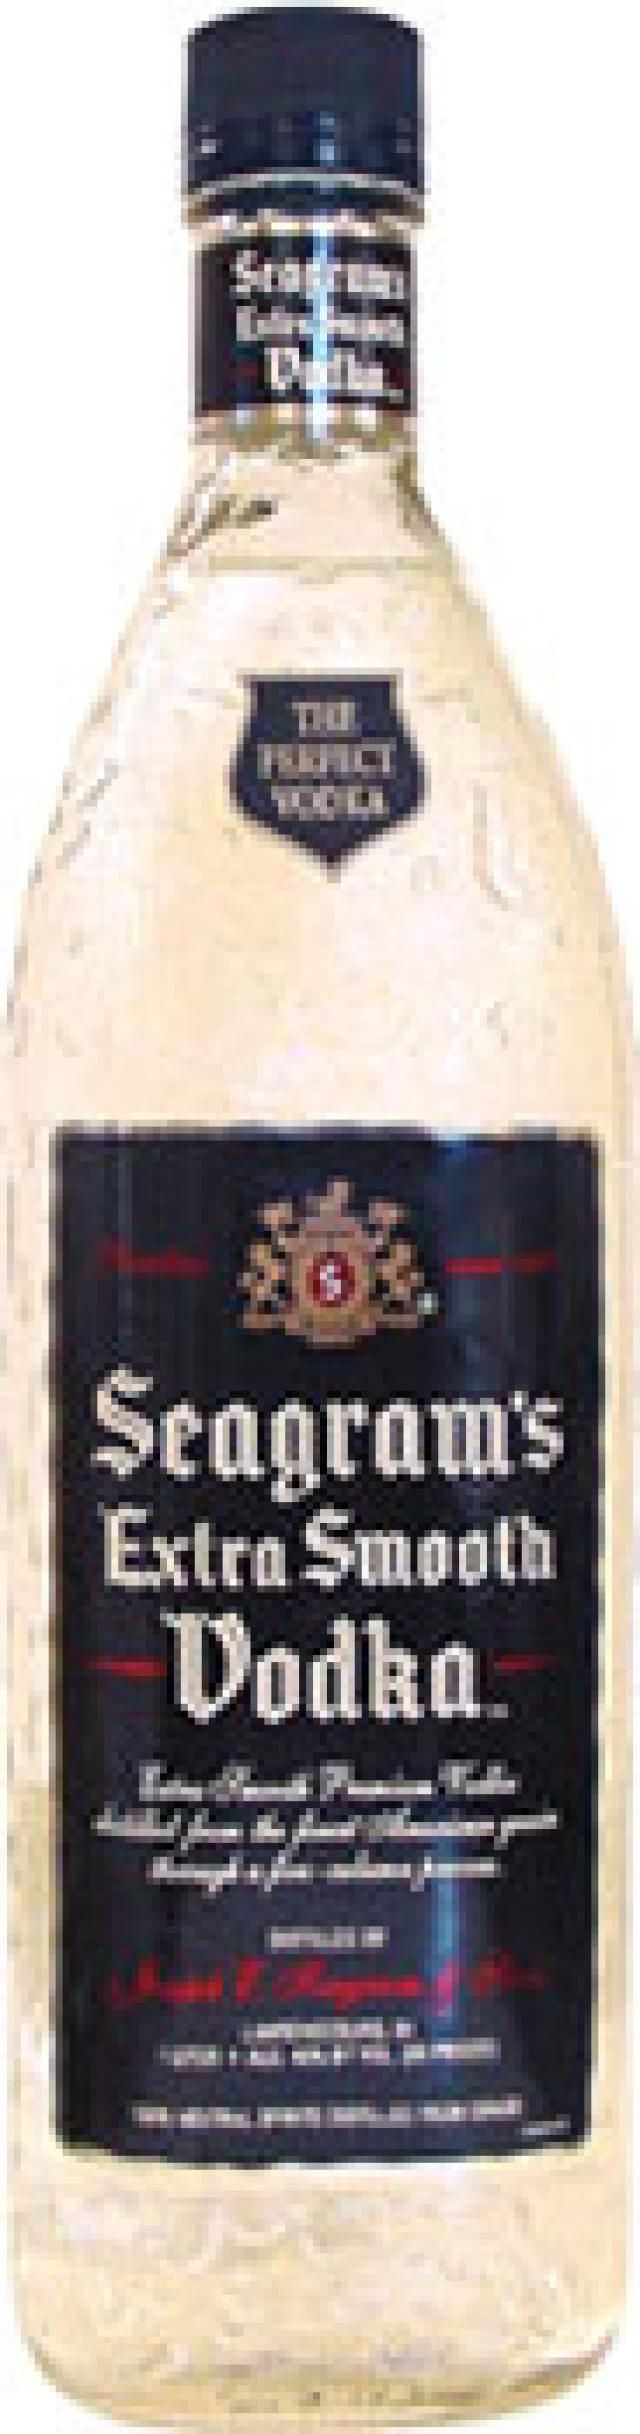 6 Cheap Vodka Brands (Under $10) You Won't Mind Serving: Seagram's Vodka